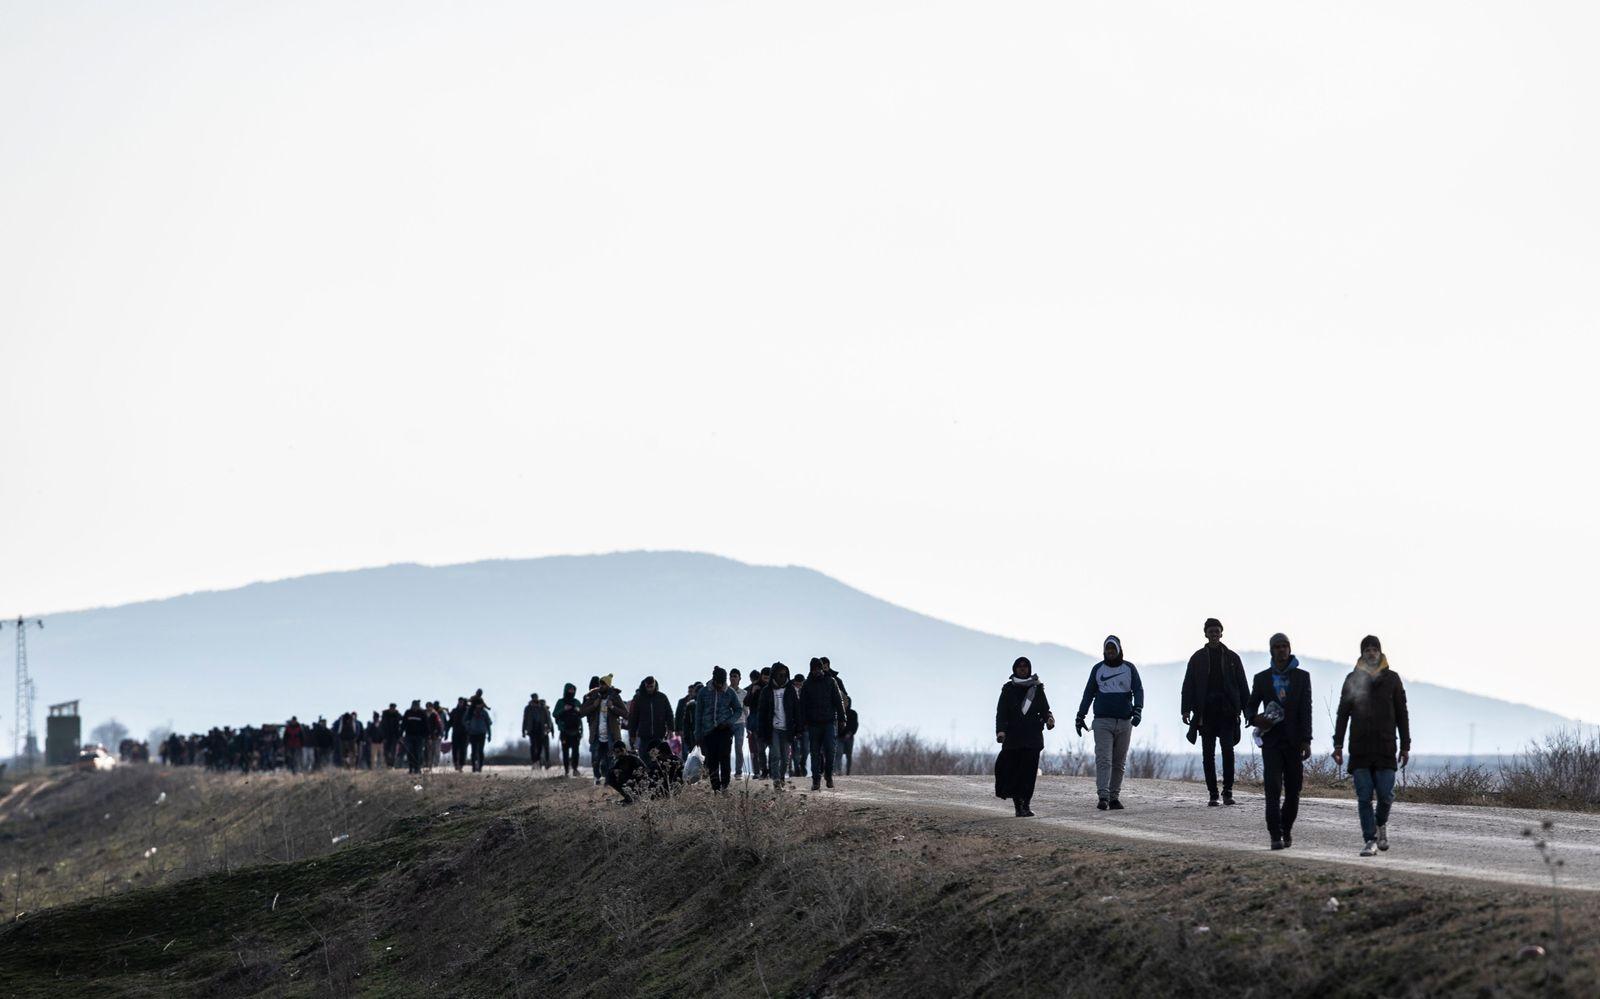 Refugees and migrants gather at Turkish-Greek land border, Edirne, Turkey - 01 Mar 2020